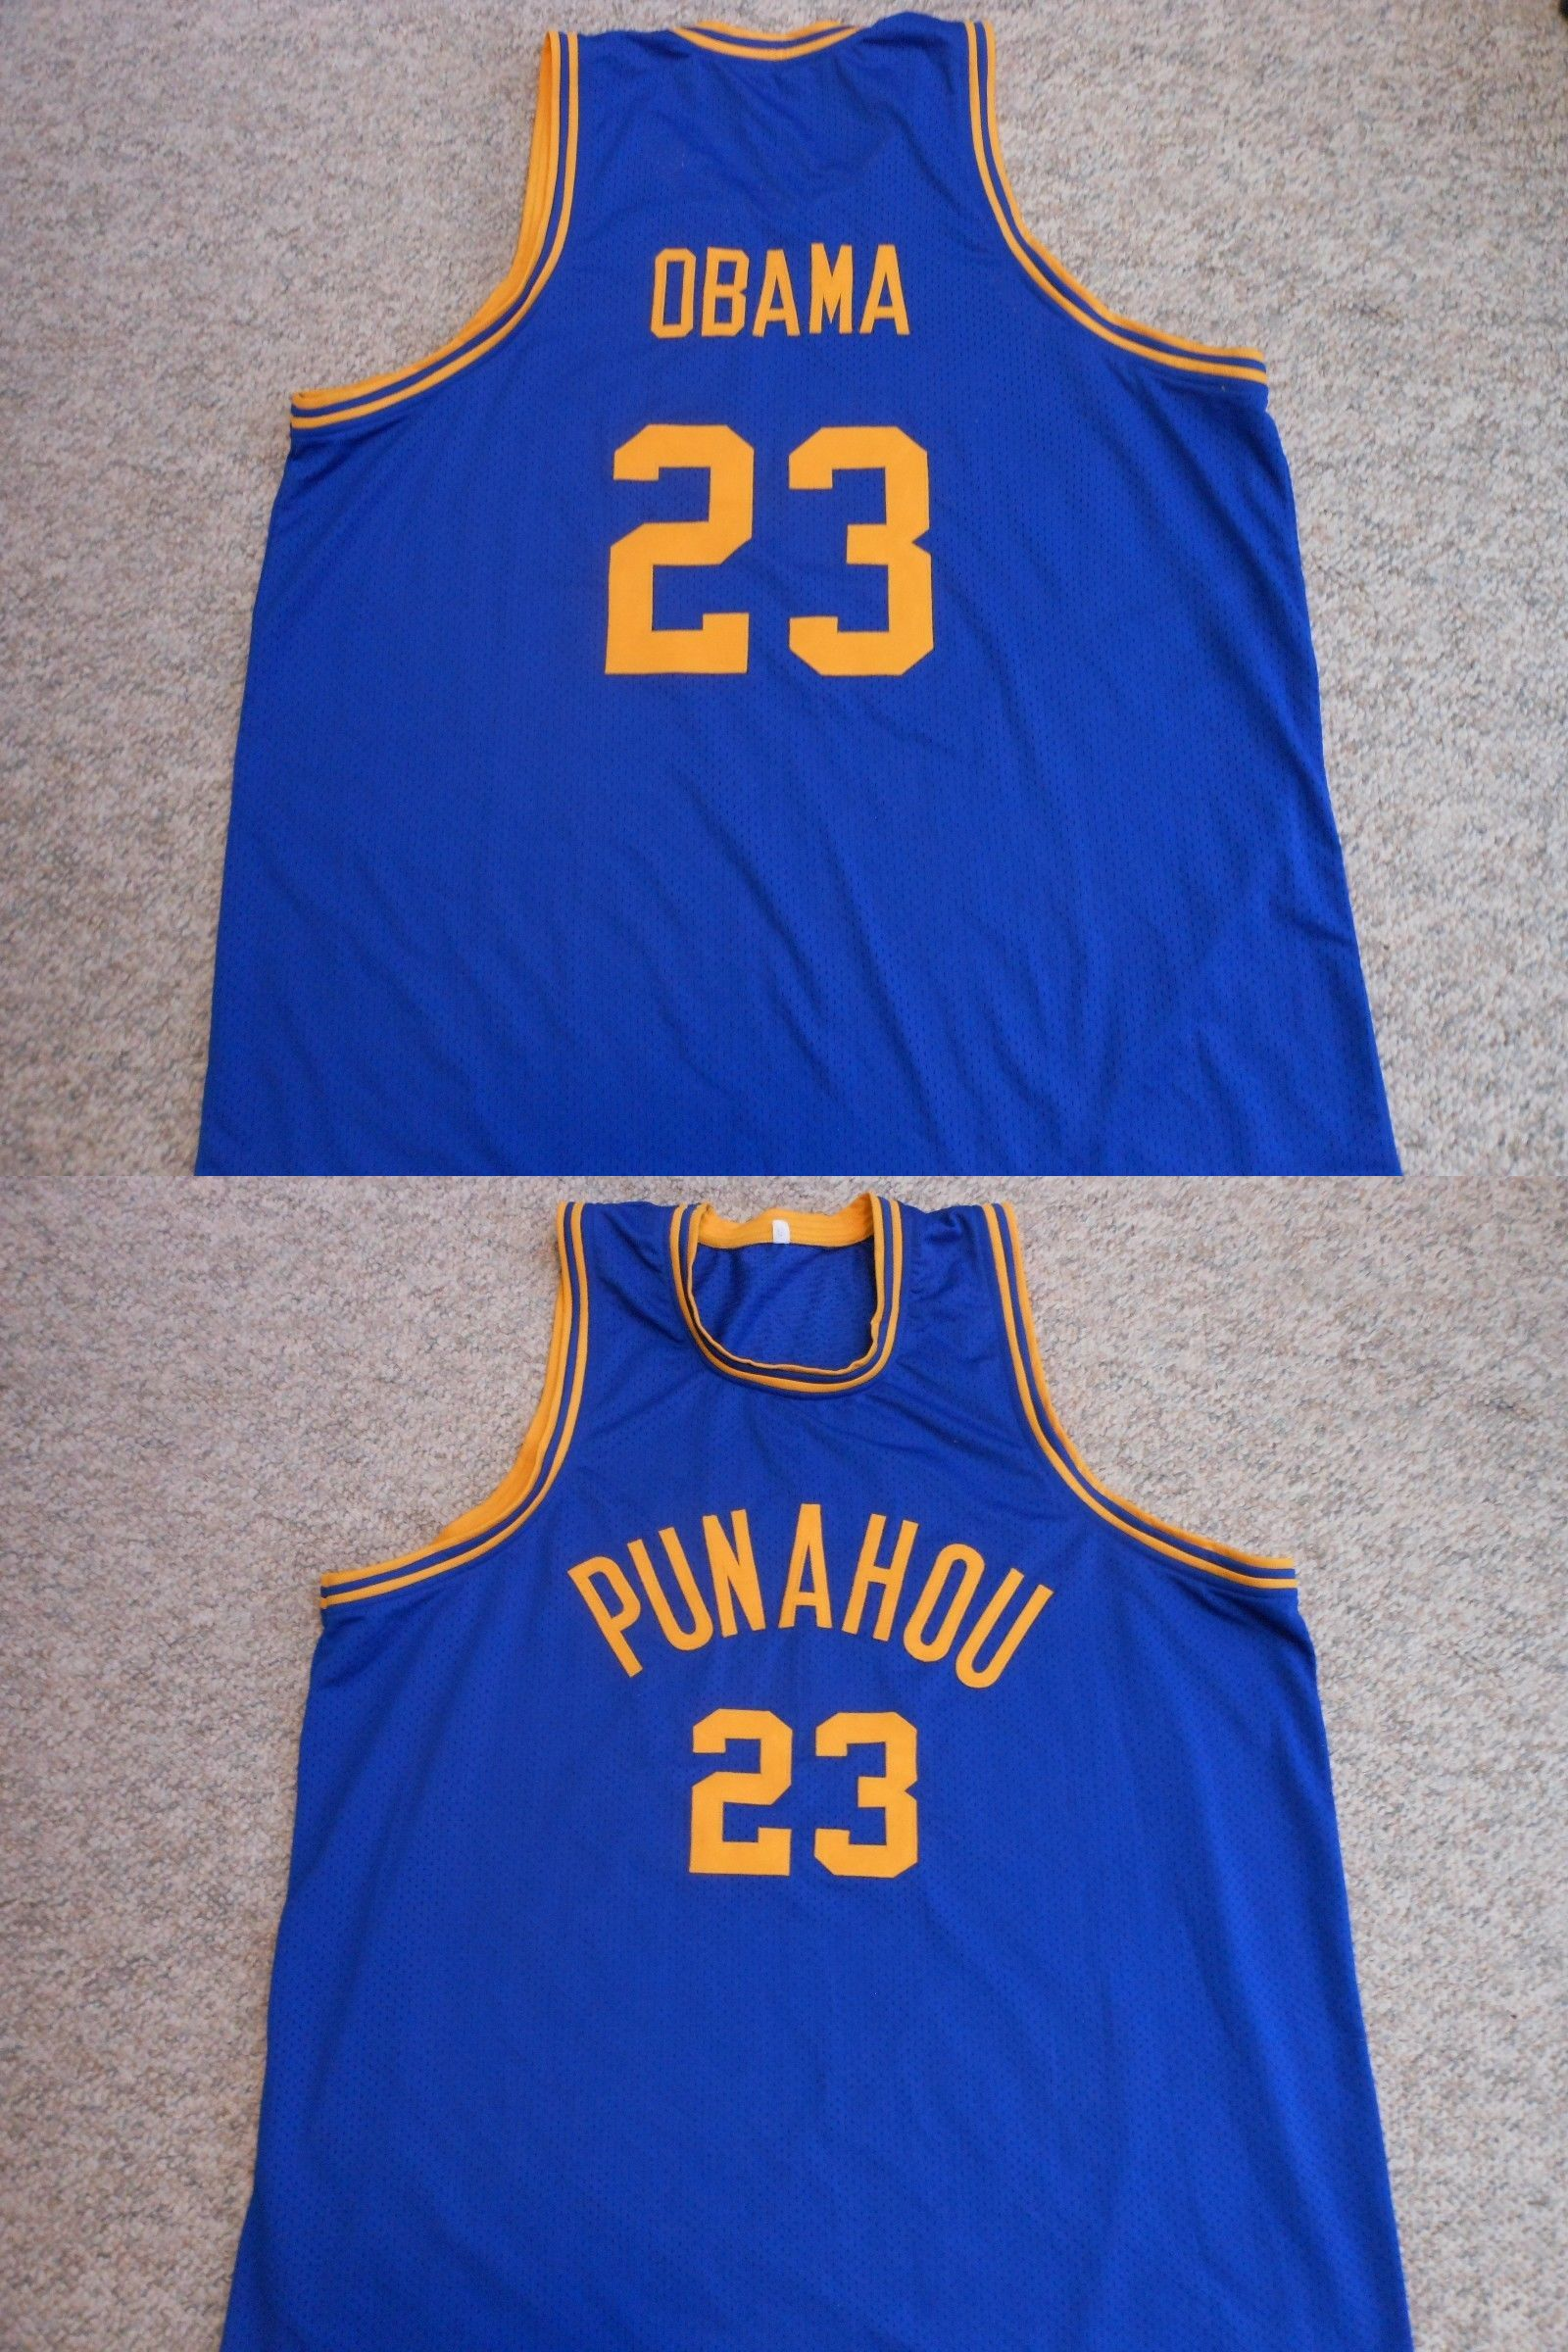 2de2d7518a5b Basketball-Other 205  Punahou High School  23 Barack Obama Sewn Basketball  Jersey (